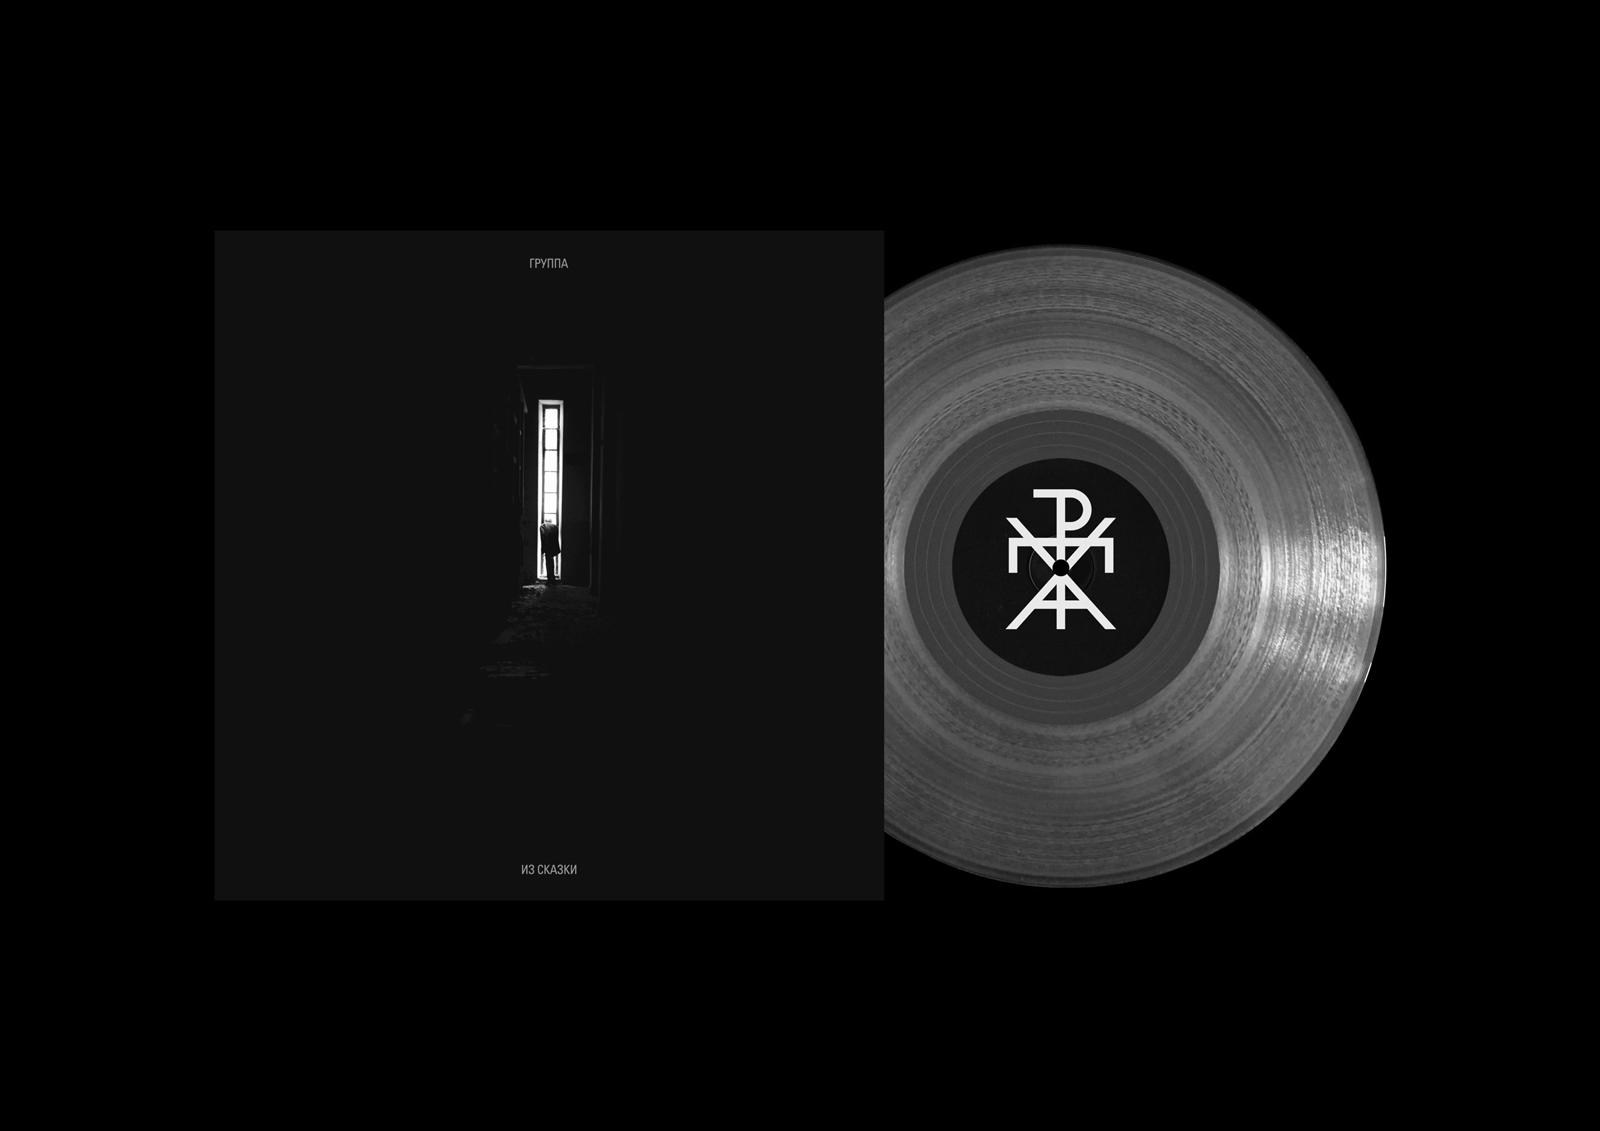 dsm_gr-uniforma_music_2_.jpg